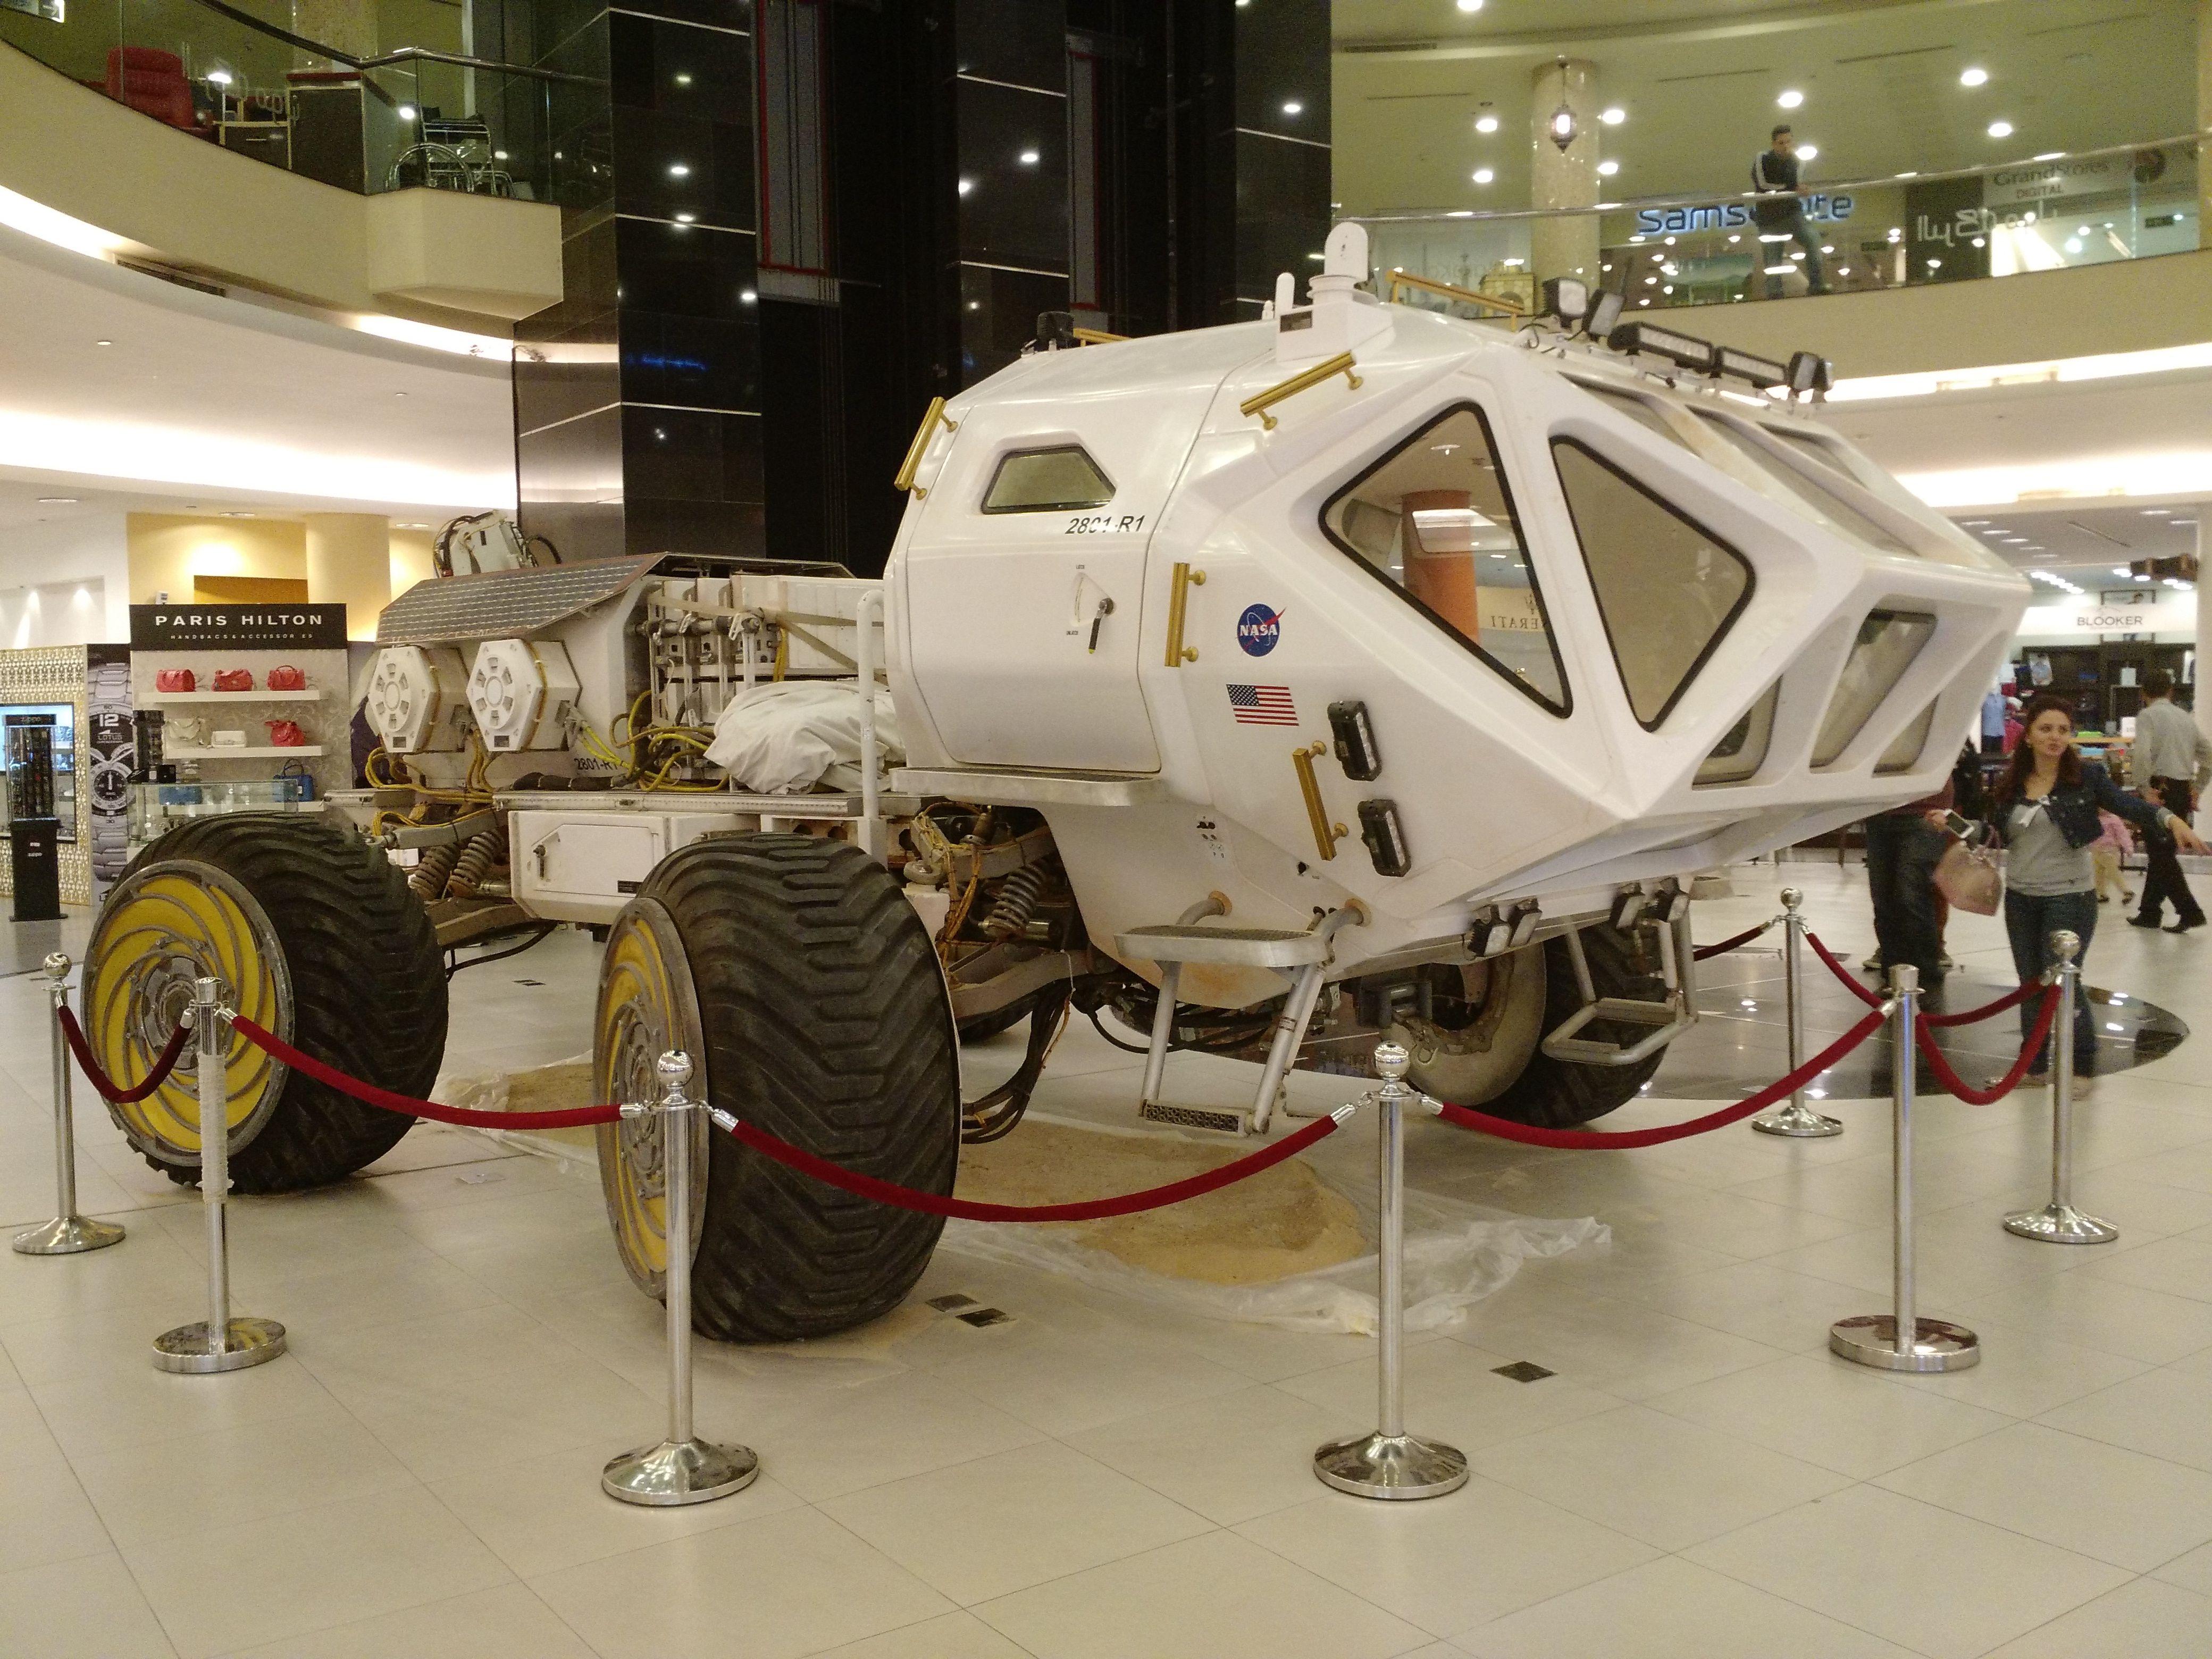 mars rover book - photo #33